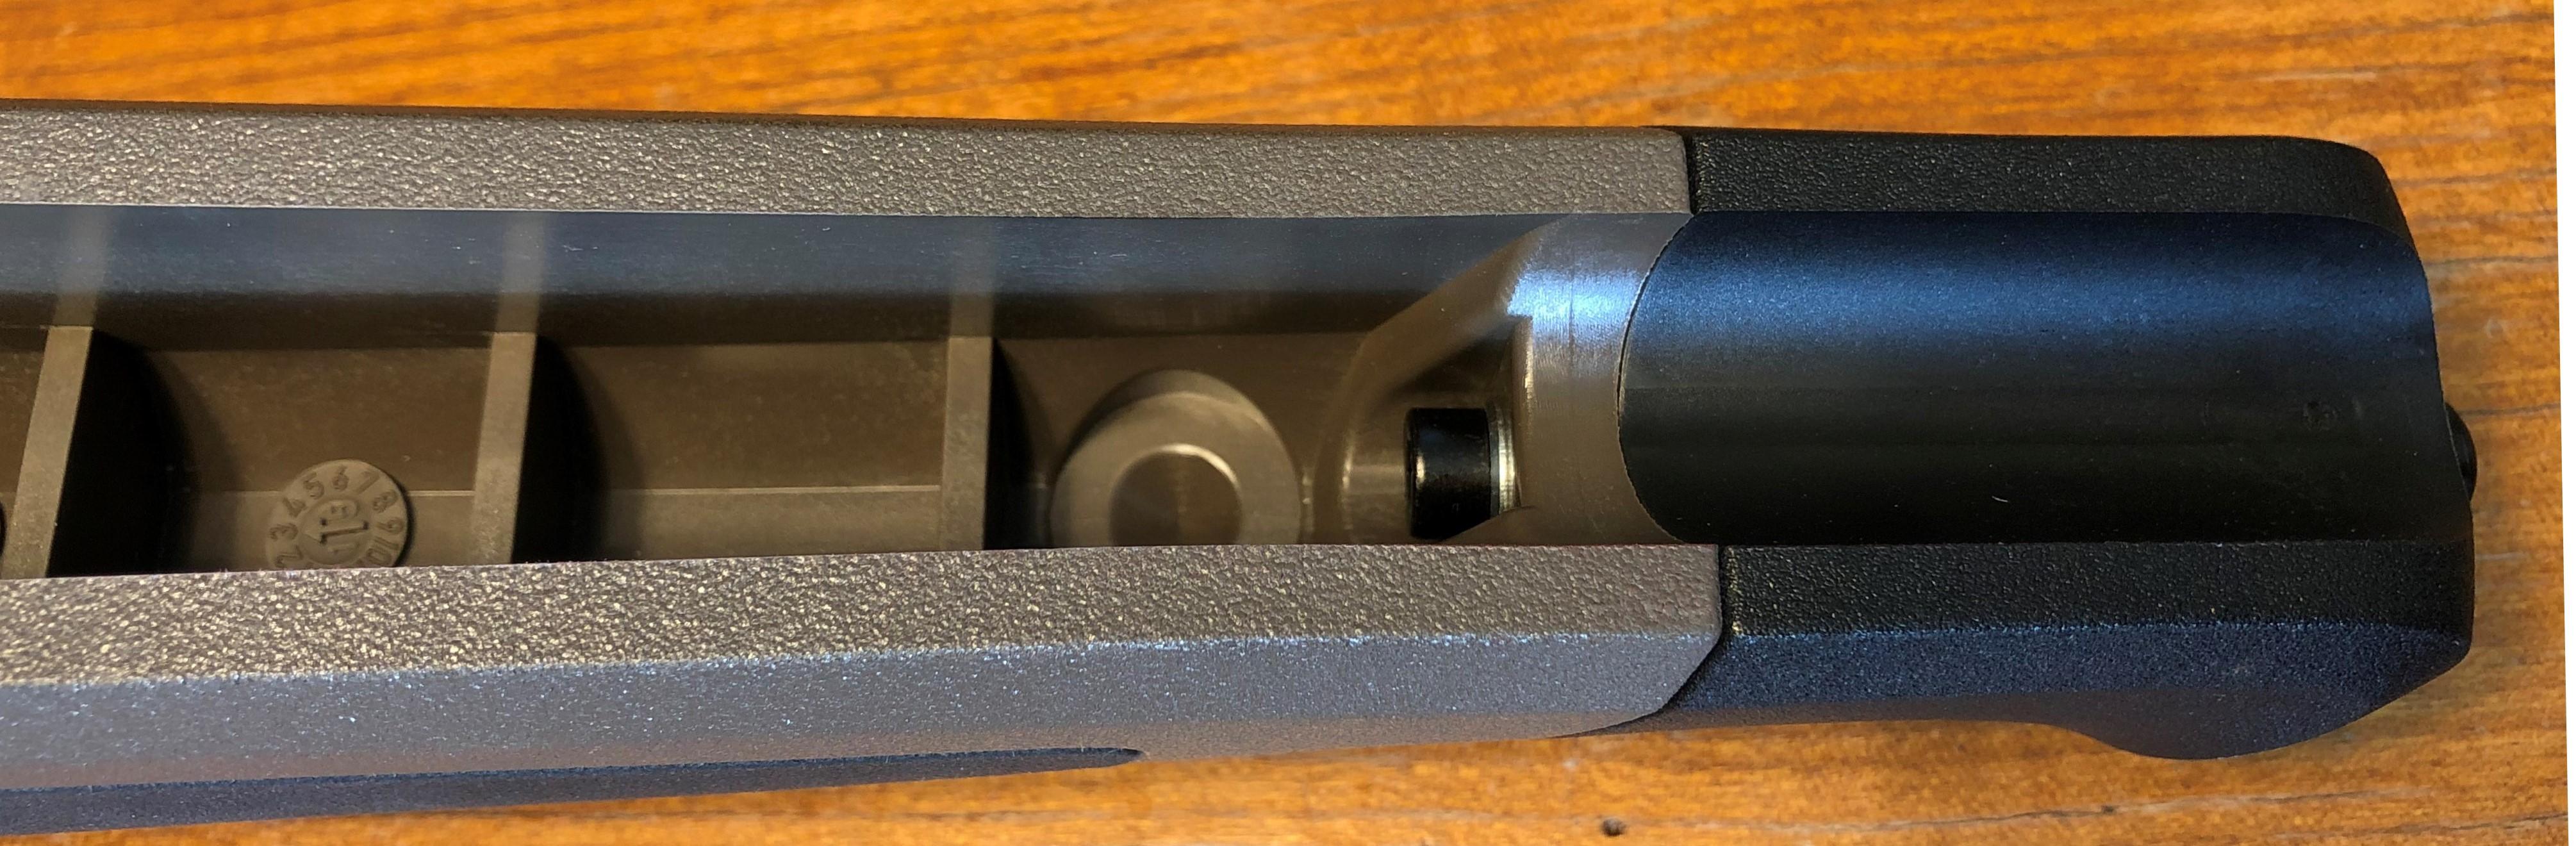 R8 forearm.jpg